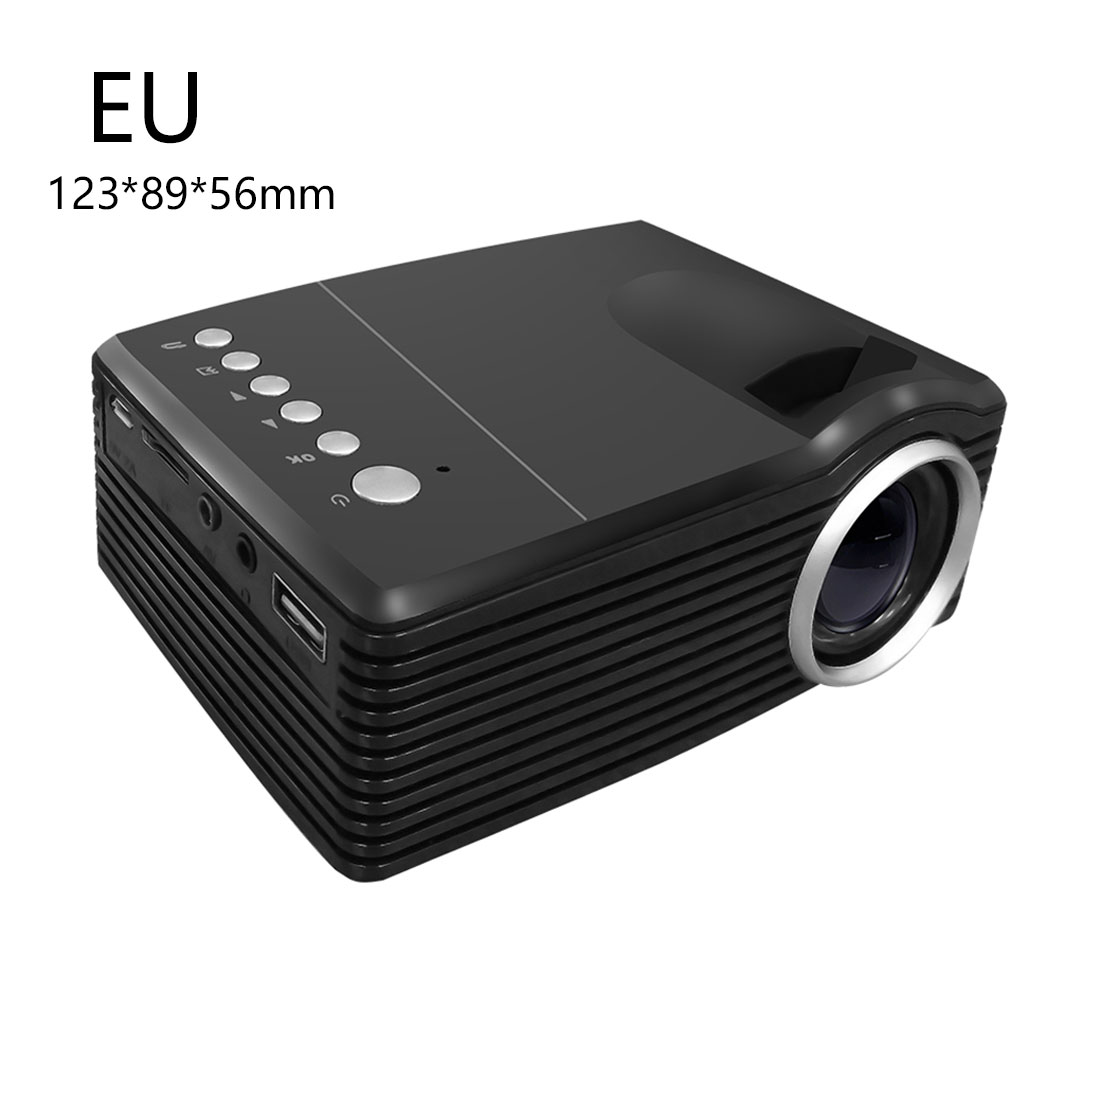 centechia MG300 Portable Hot LCD LED Projector 3.5mm Audio 320x240 EU Plug Pixel HDMI USB Mini MG300 Projector Home Media Player